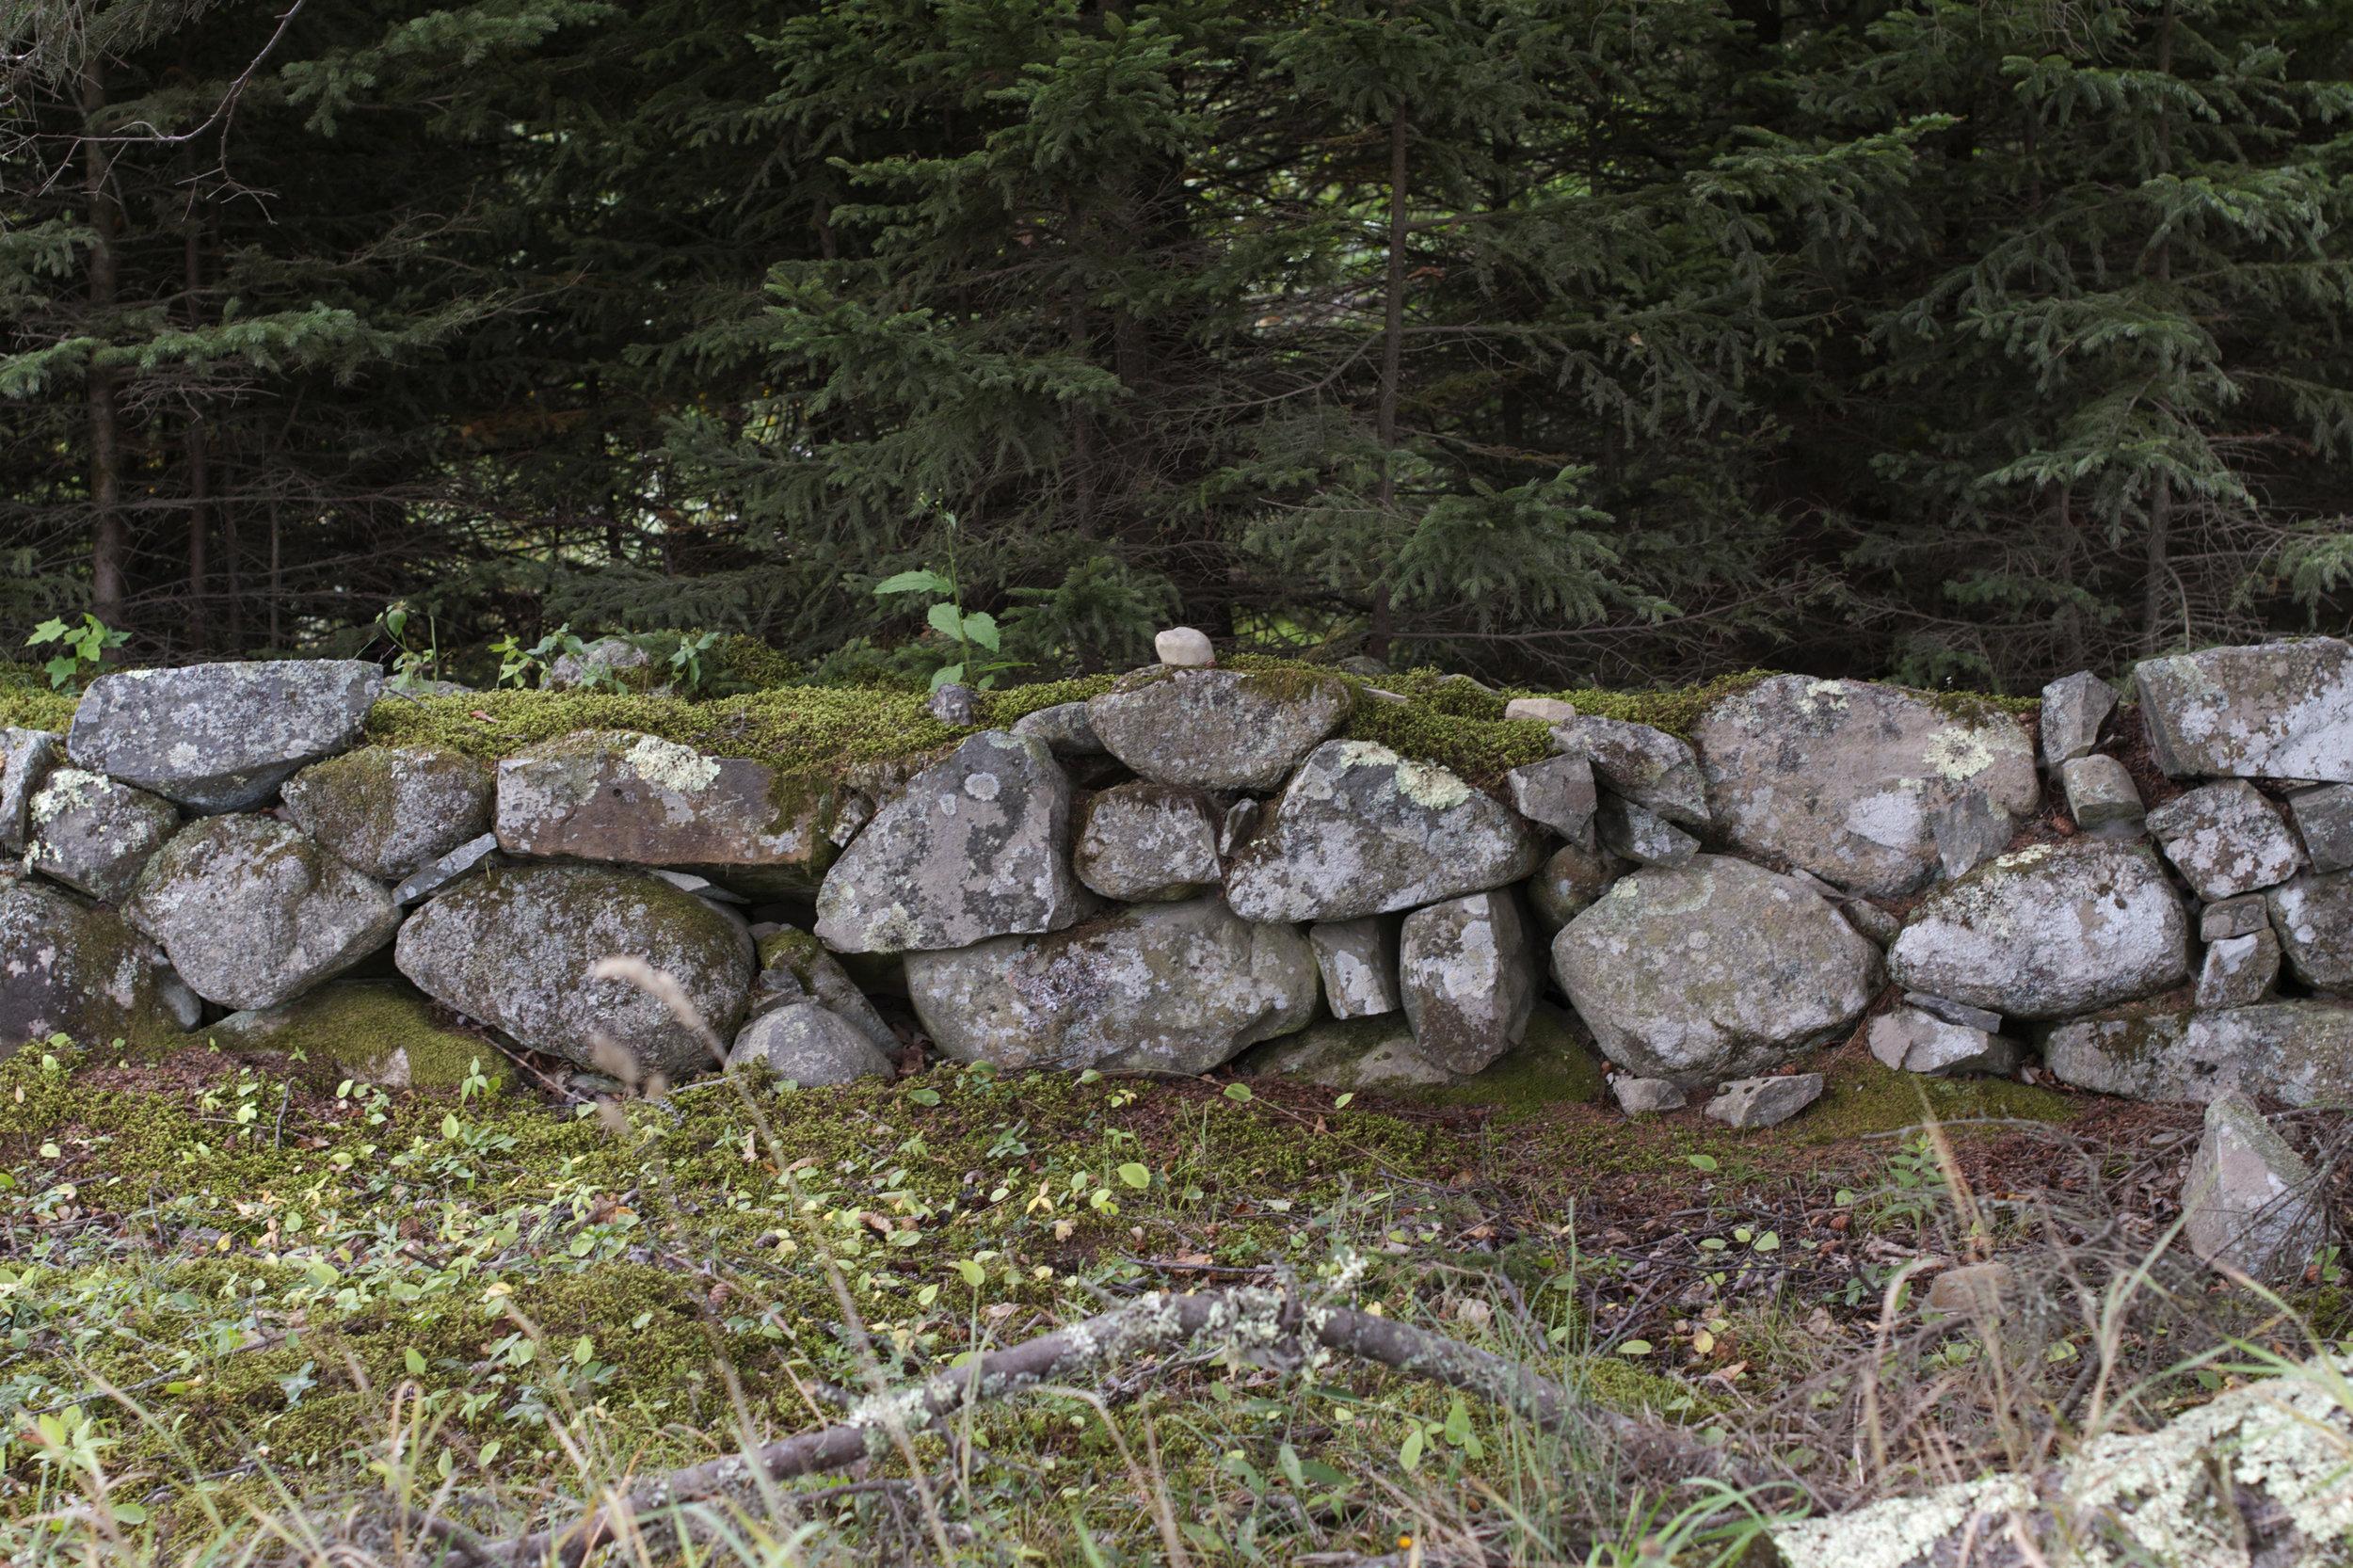 stone-wall-moss-covered.jpg